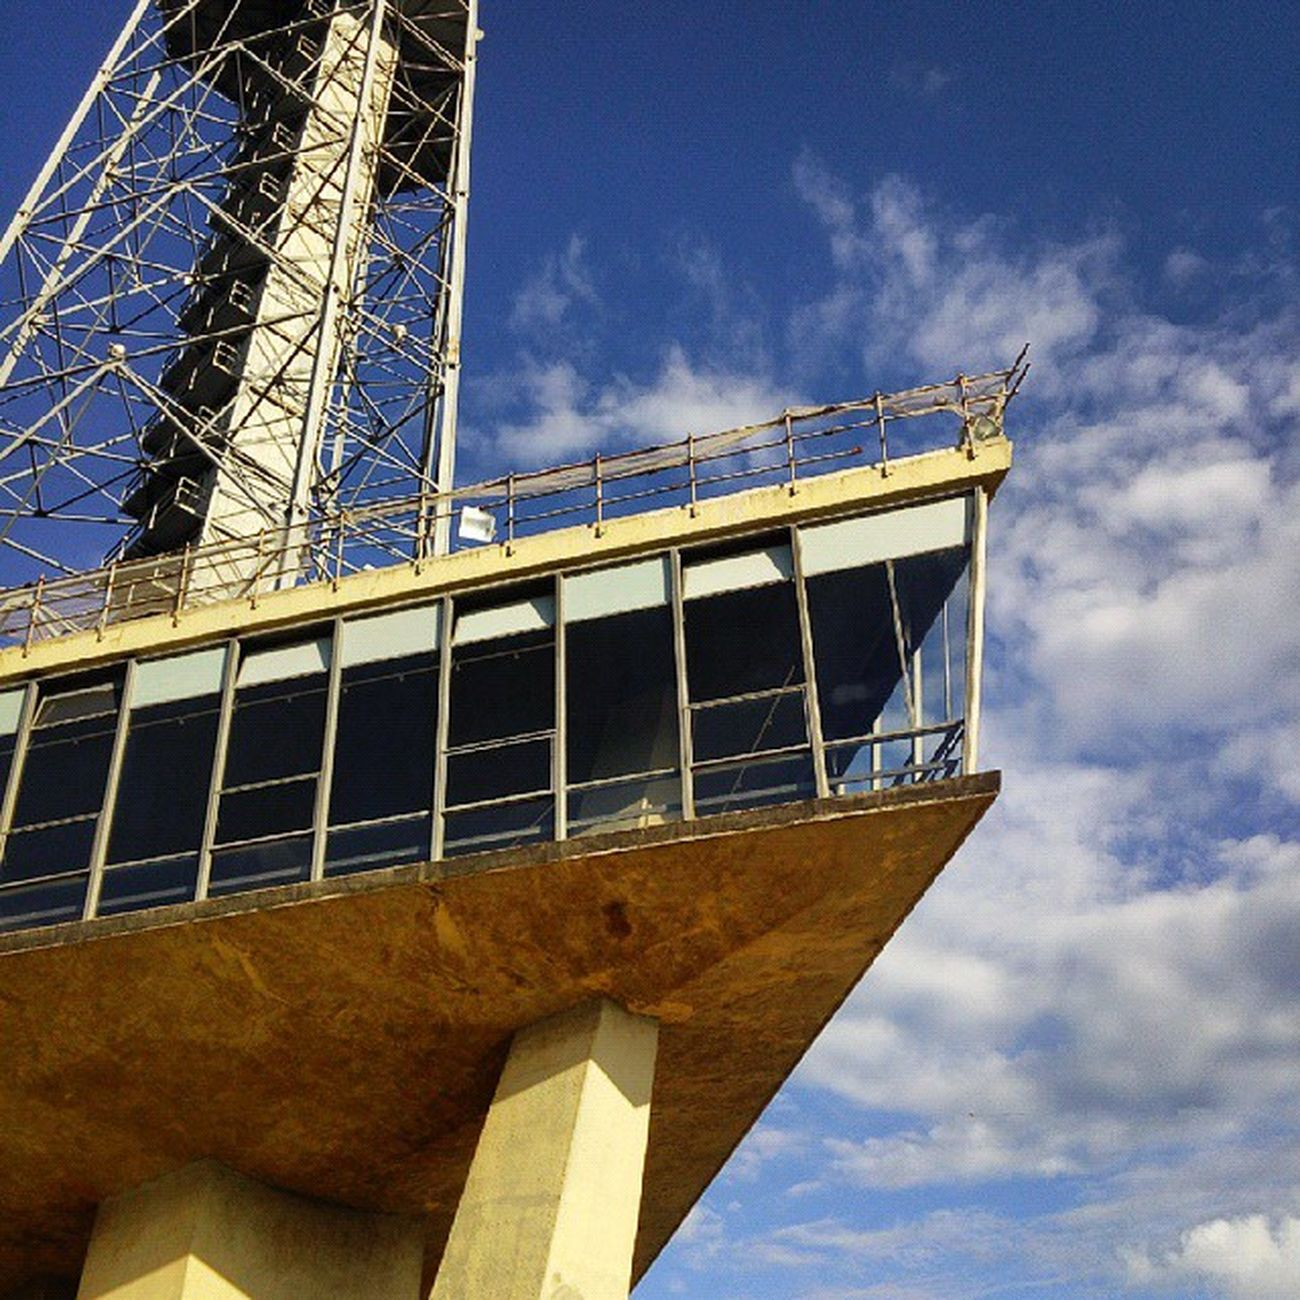 Torredetv Eixomonumental Brasília